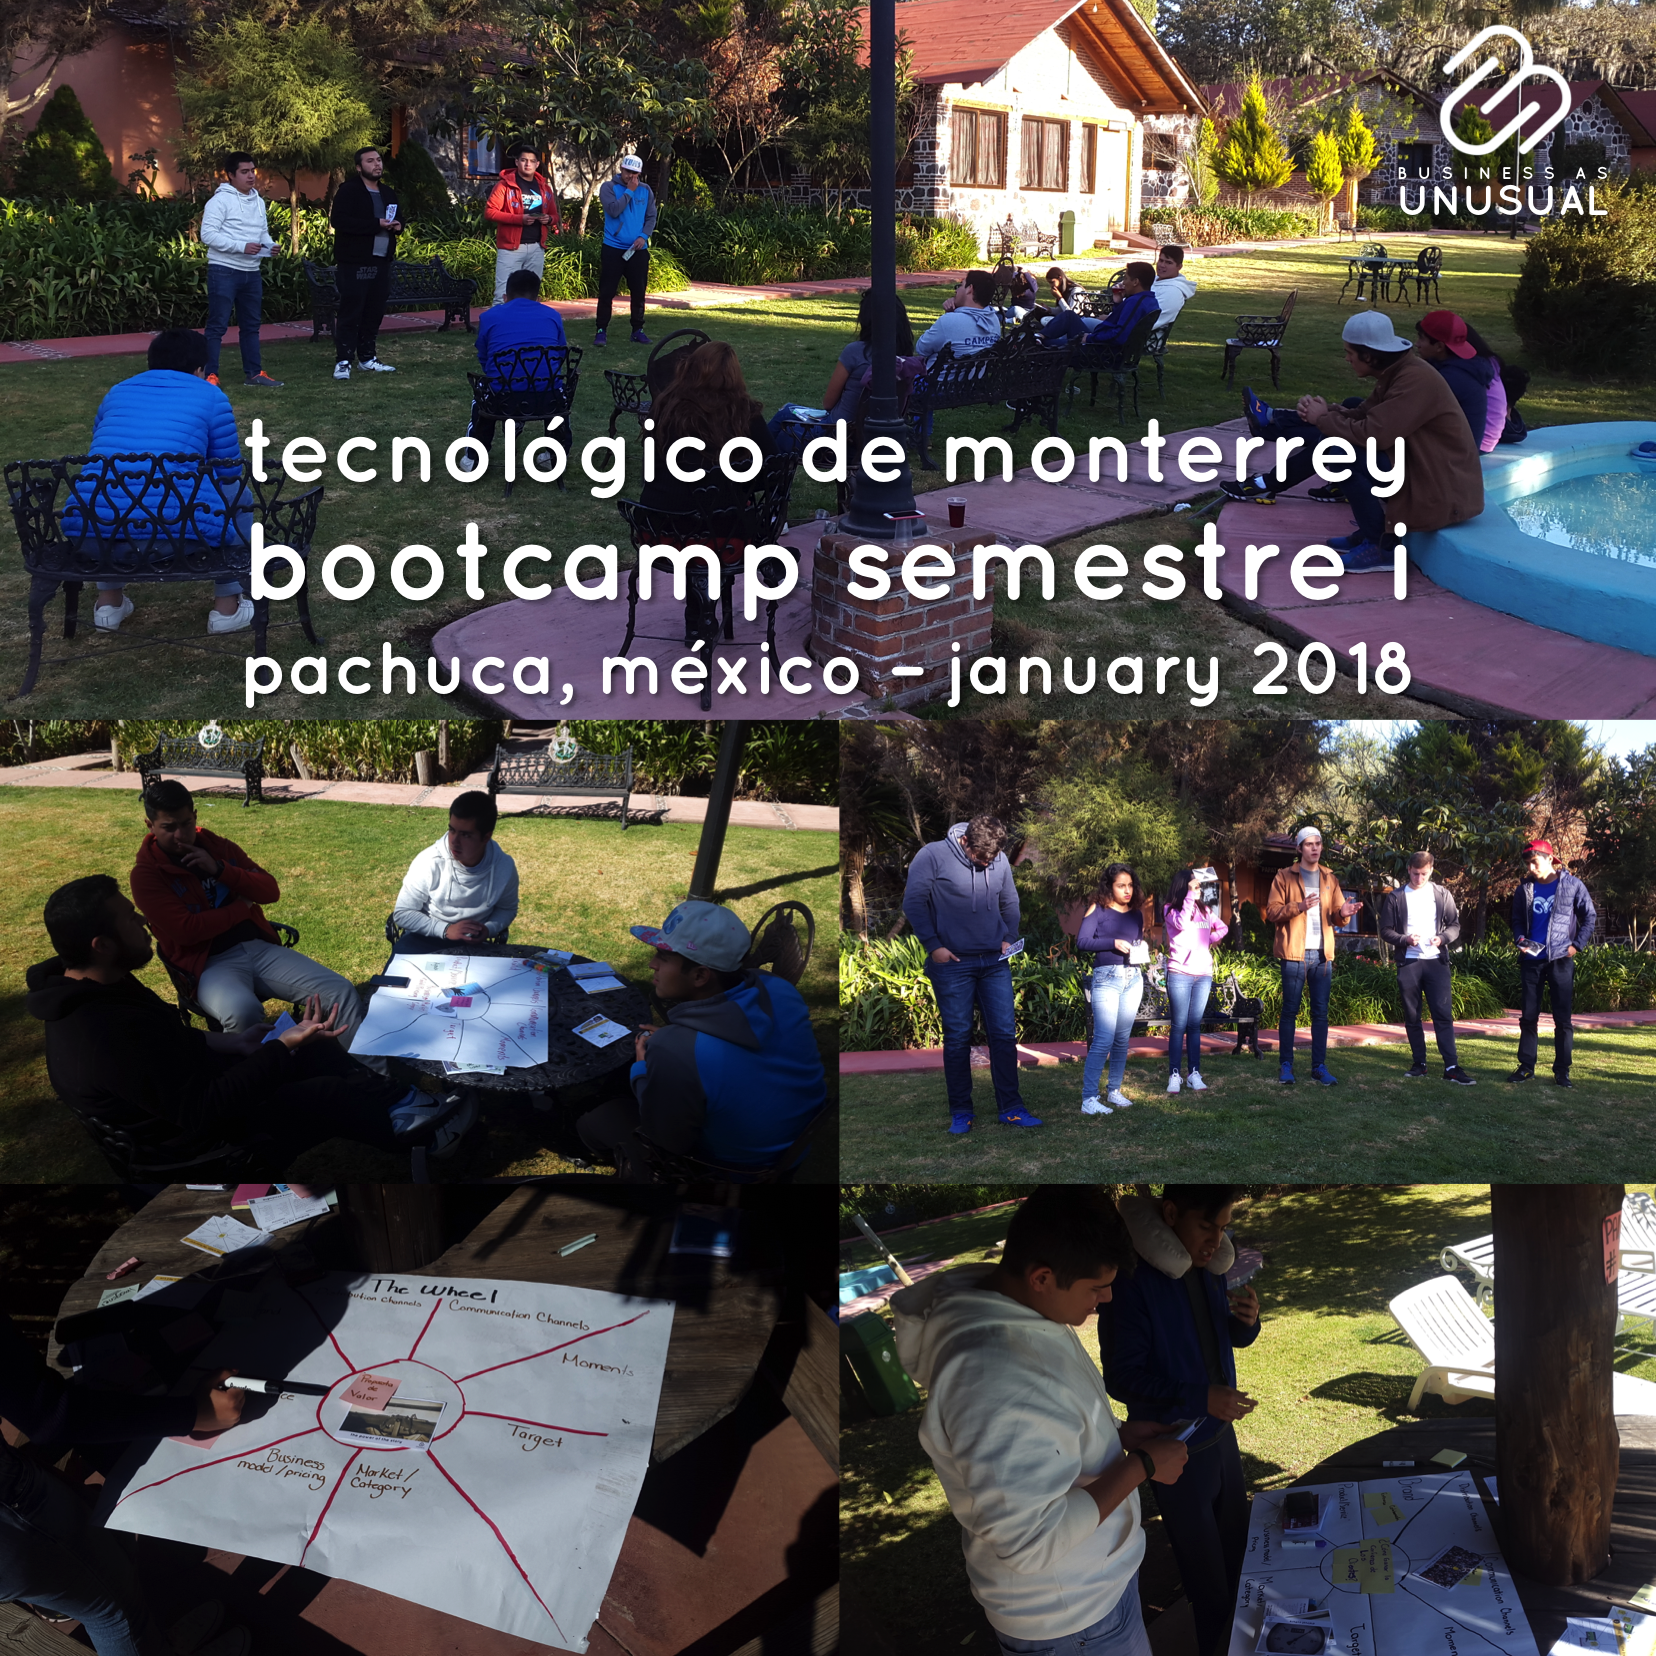 Instituto Tecnológico de Monterrey - Bootcamp Semester i - Pachuca 2018